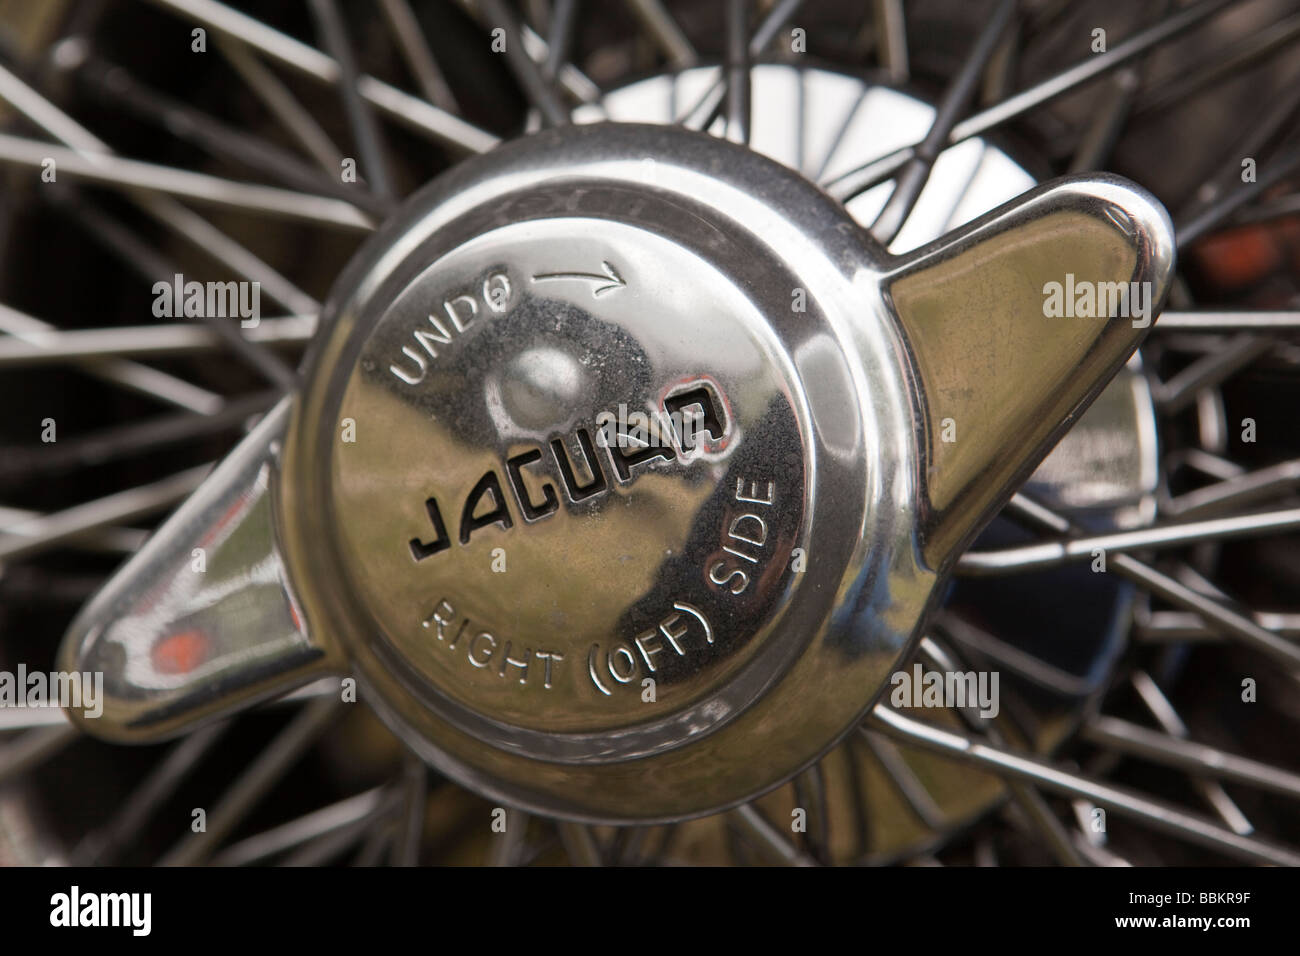 Motoring wheel spinner of classic old British made 1960s E type Jaguar car - Stock Image